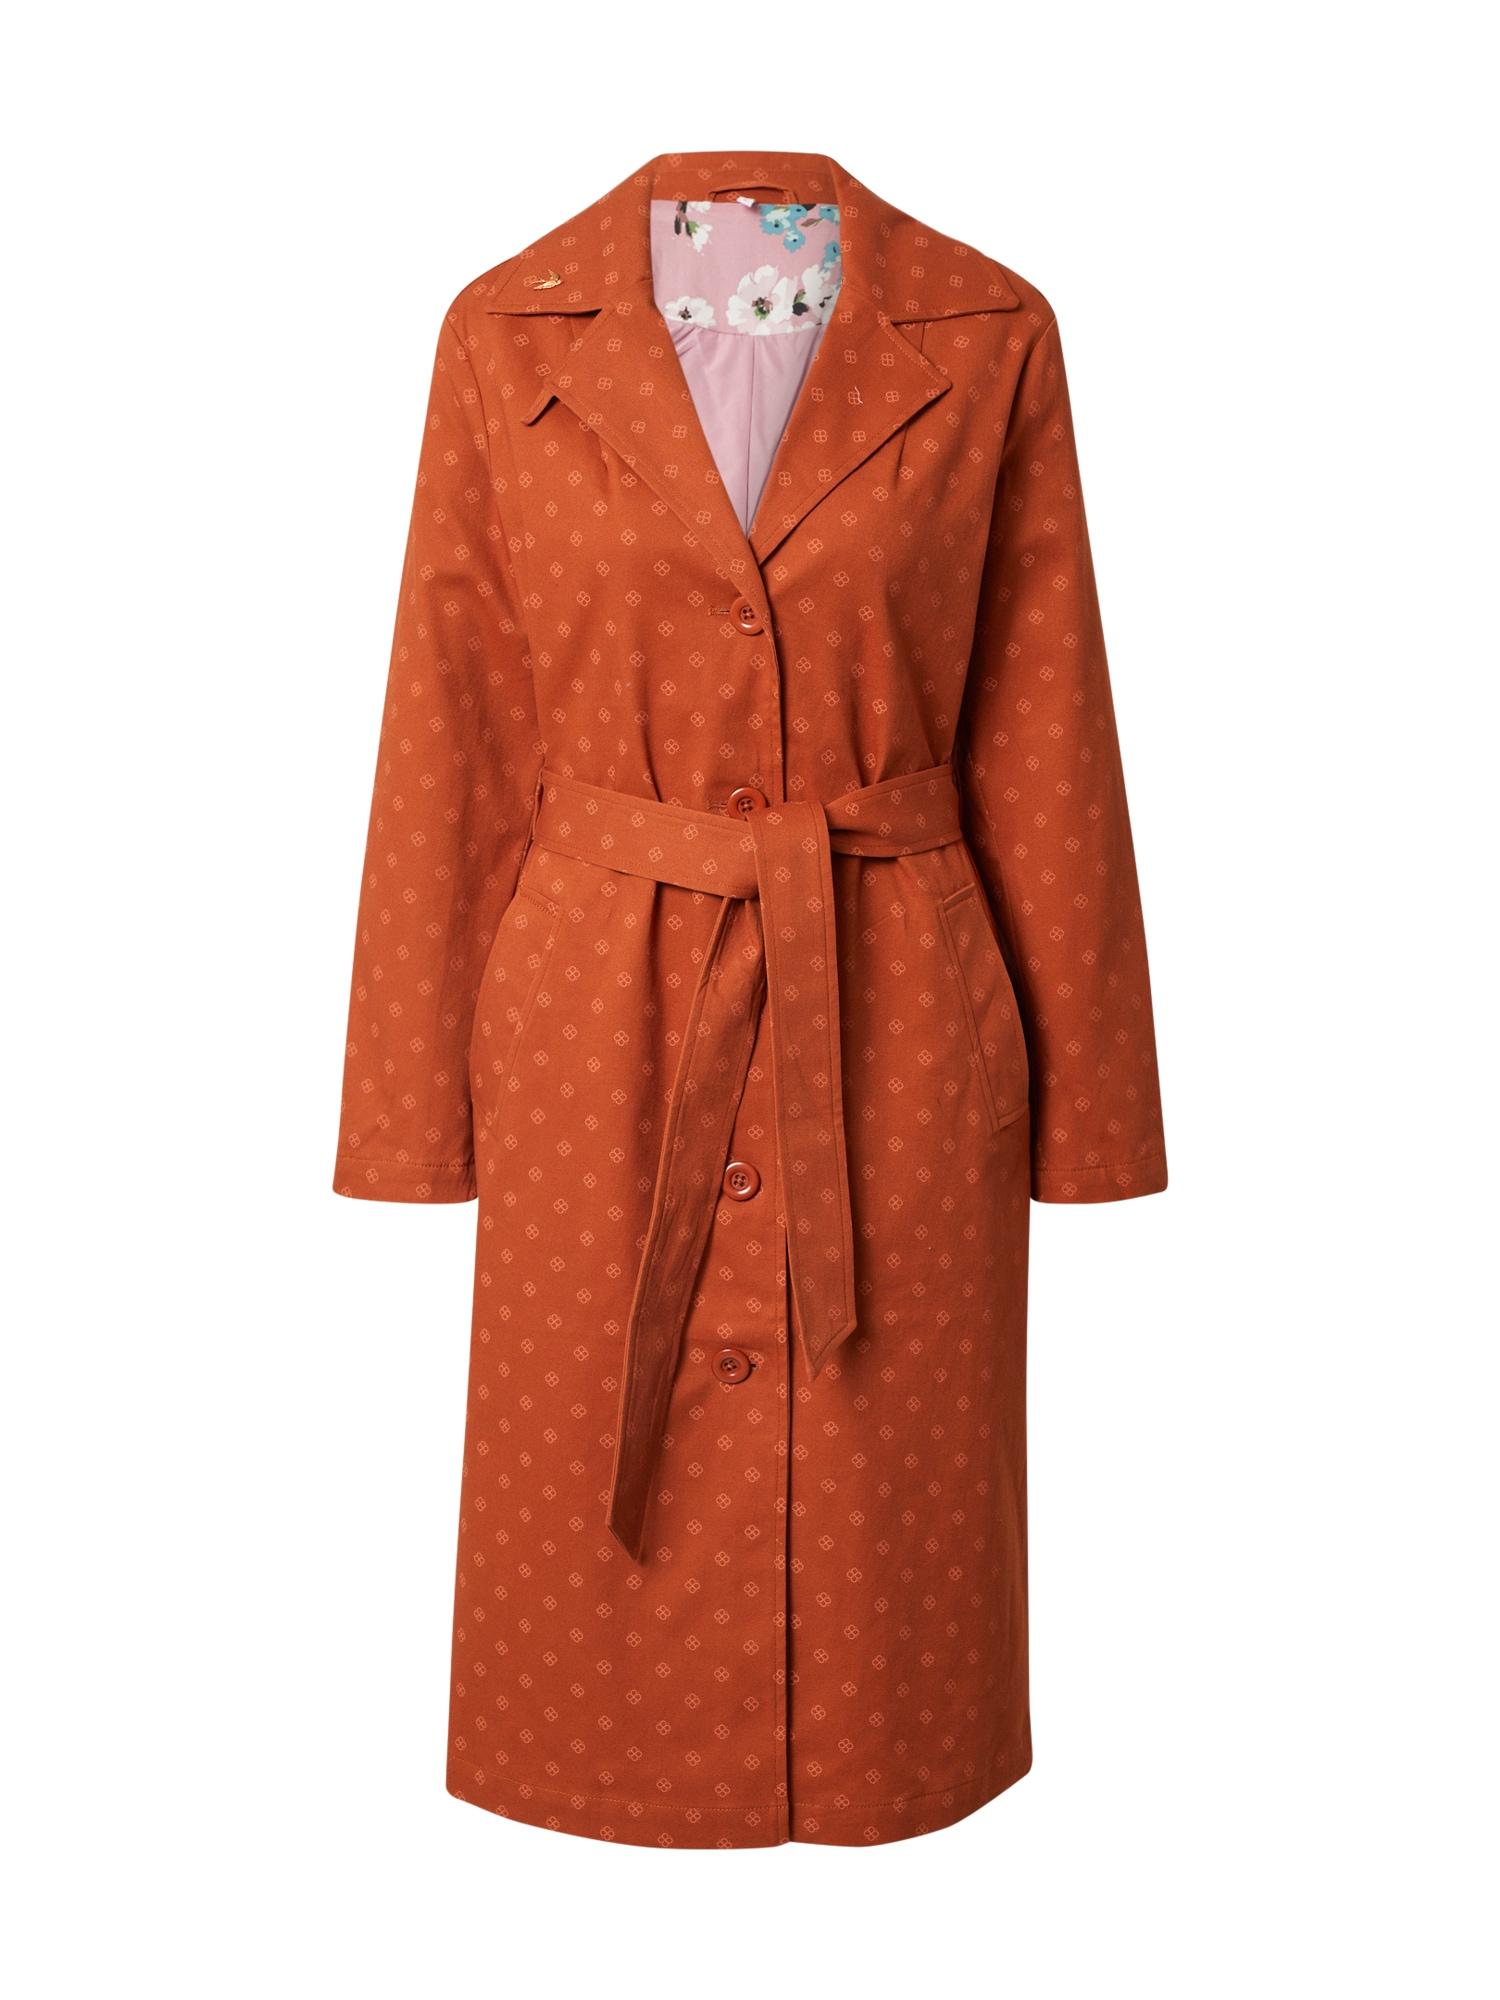 Blutsgeschwister Demisezoninis paltas abrikosų spalva